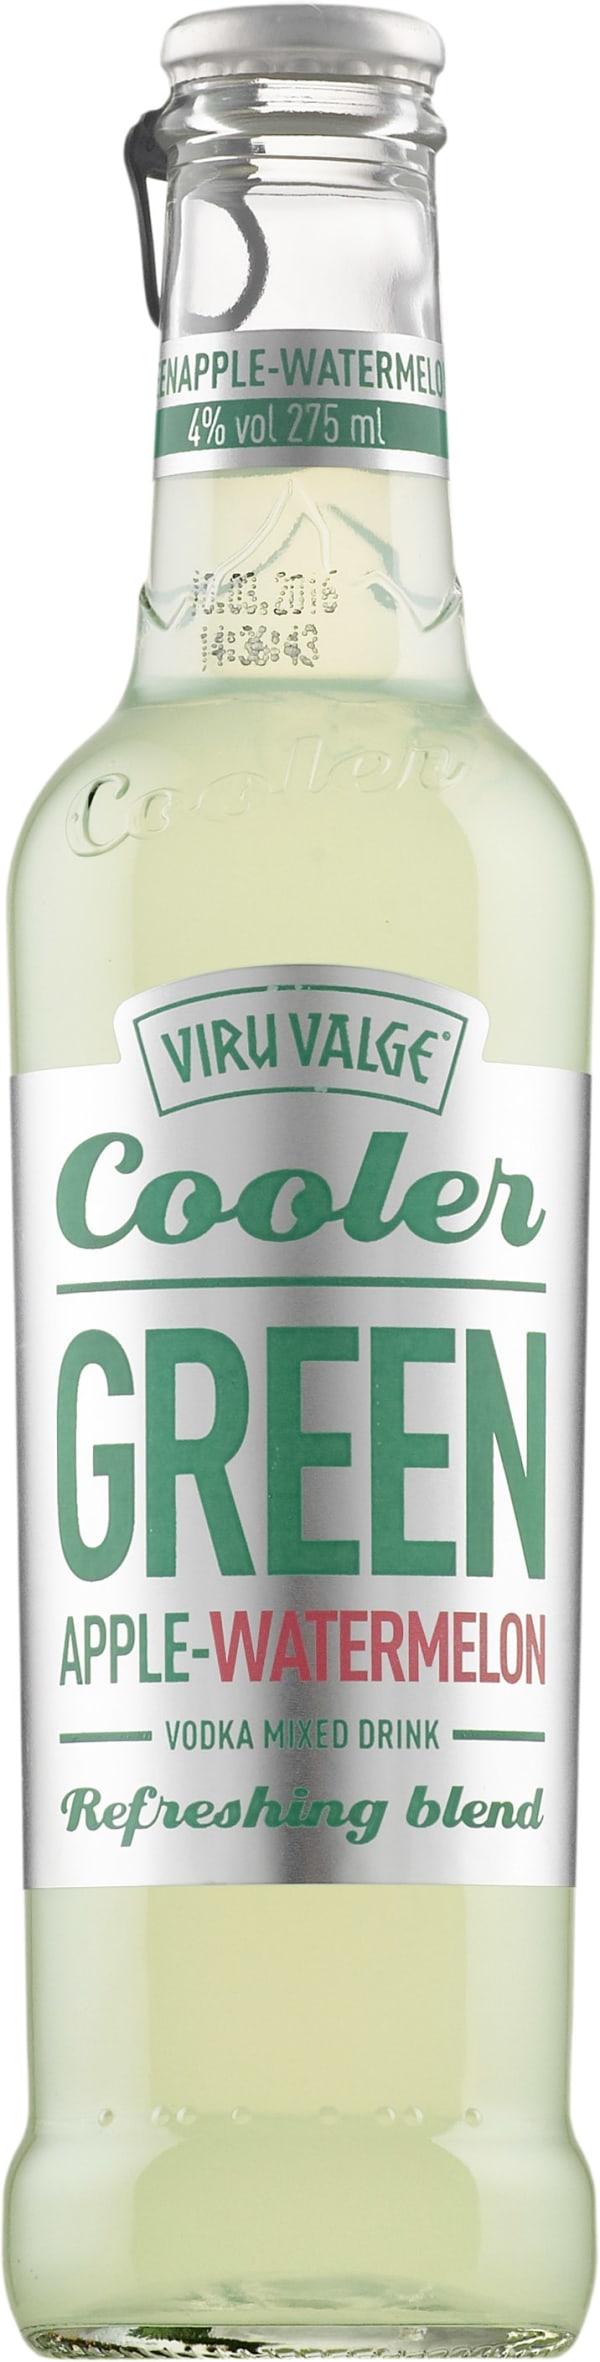 Viru Valge Cooler Green Apple-Watermelon